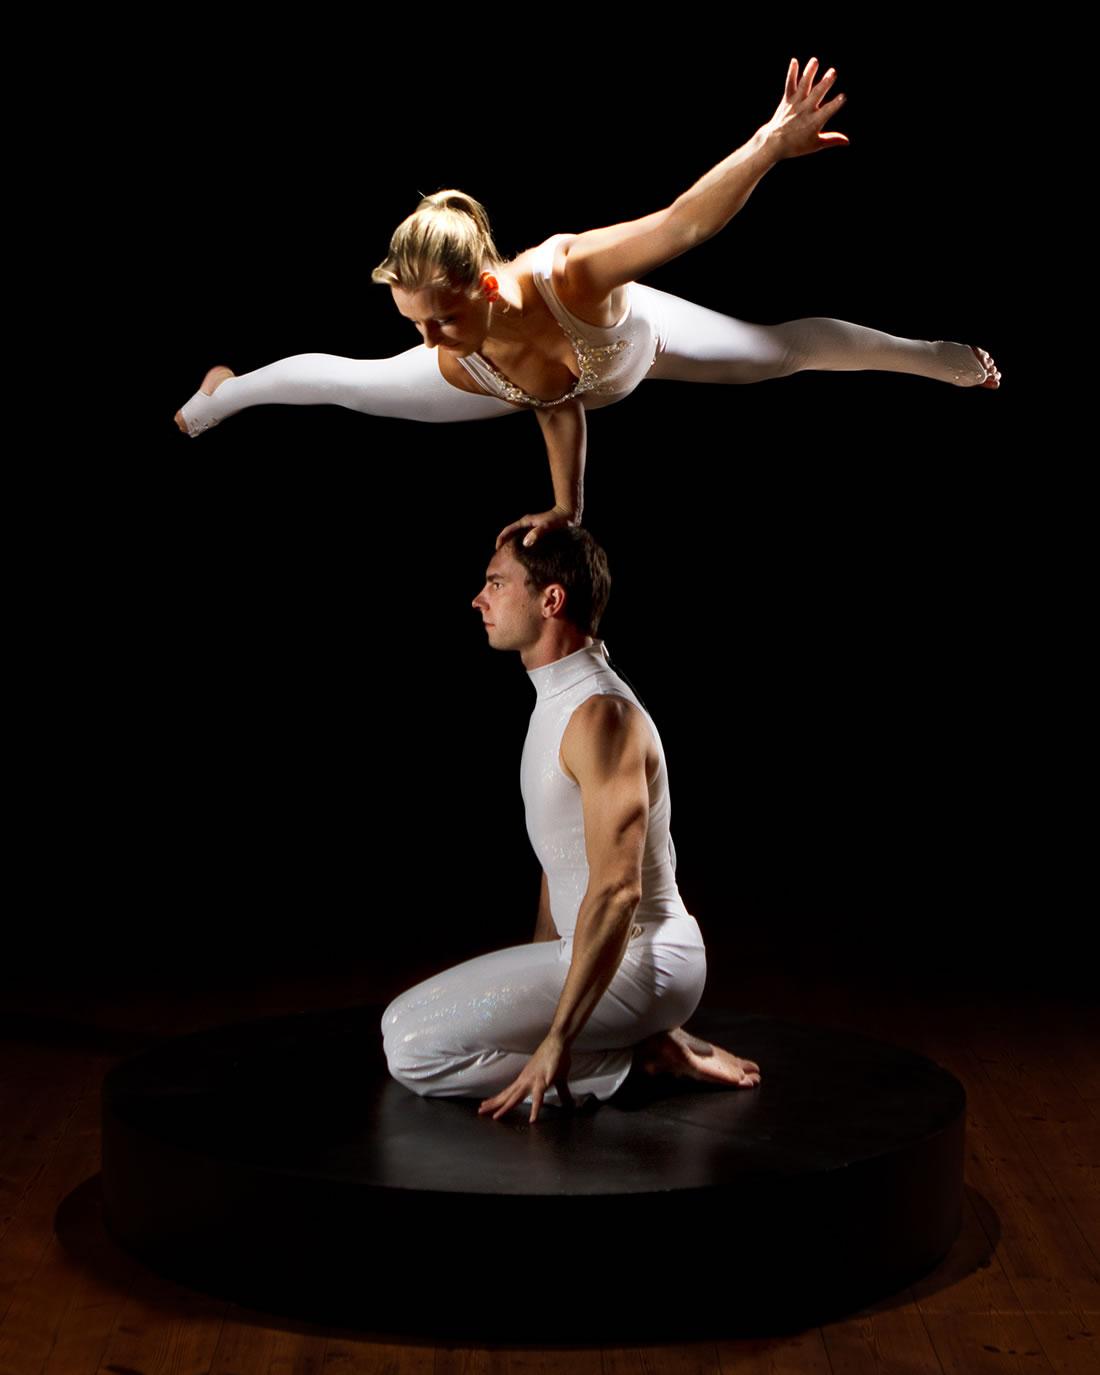 Groundbased Shows - Acrobats Gallery - Revolving podium 1